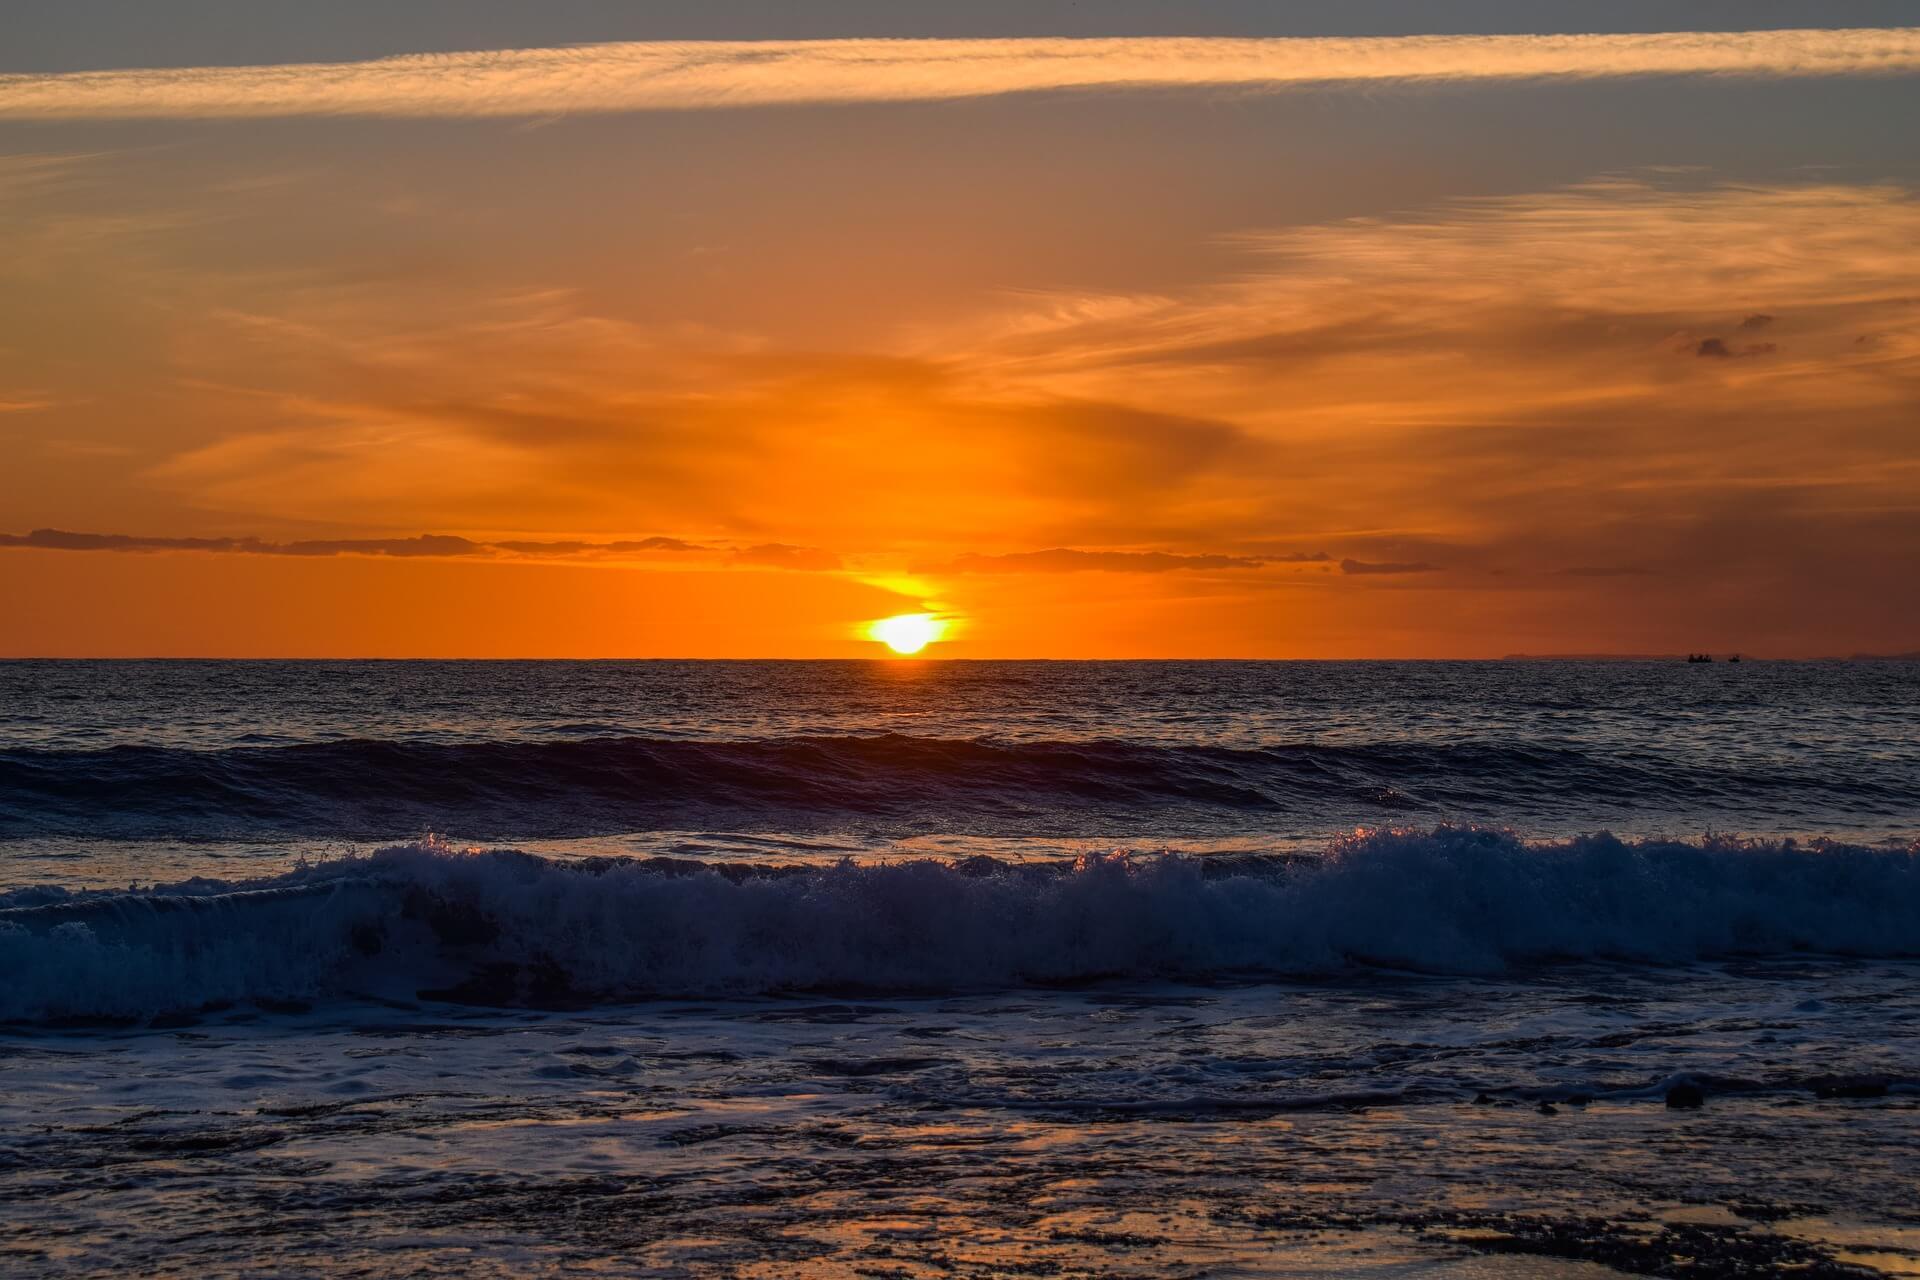 sunset-4053741_1920